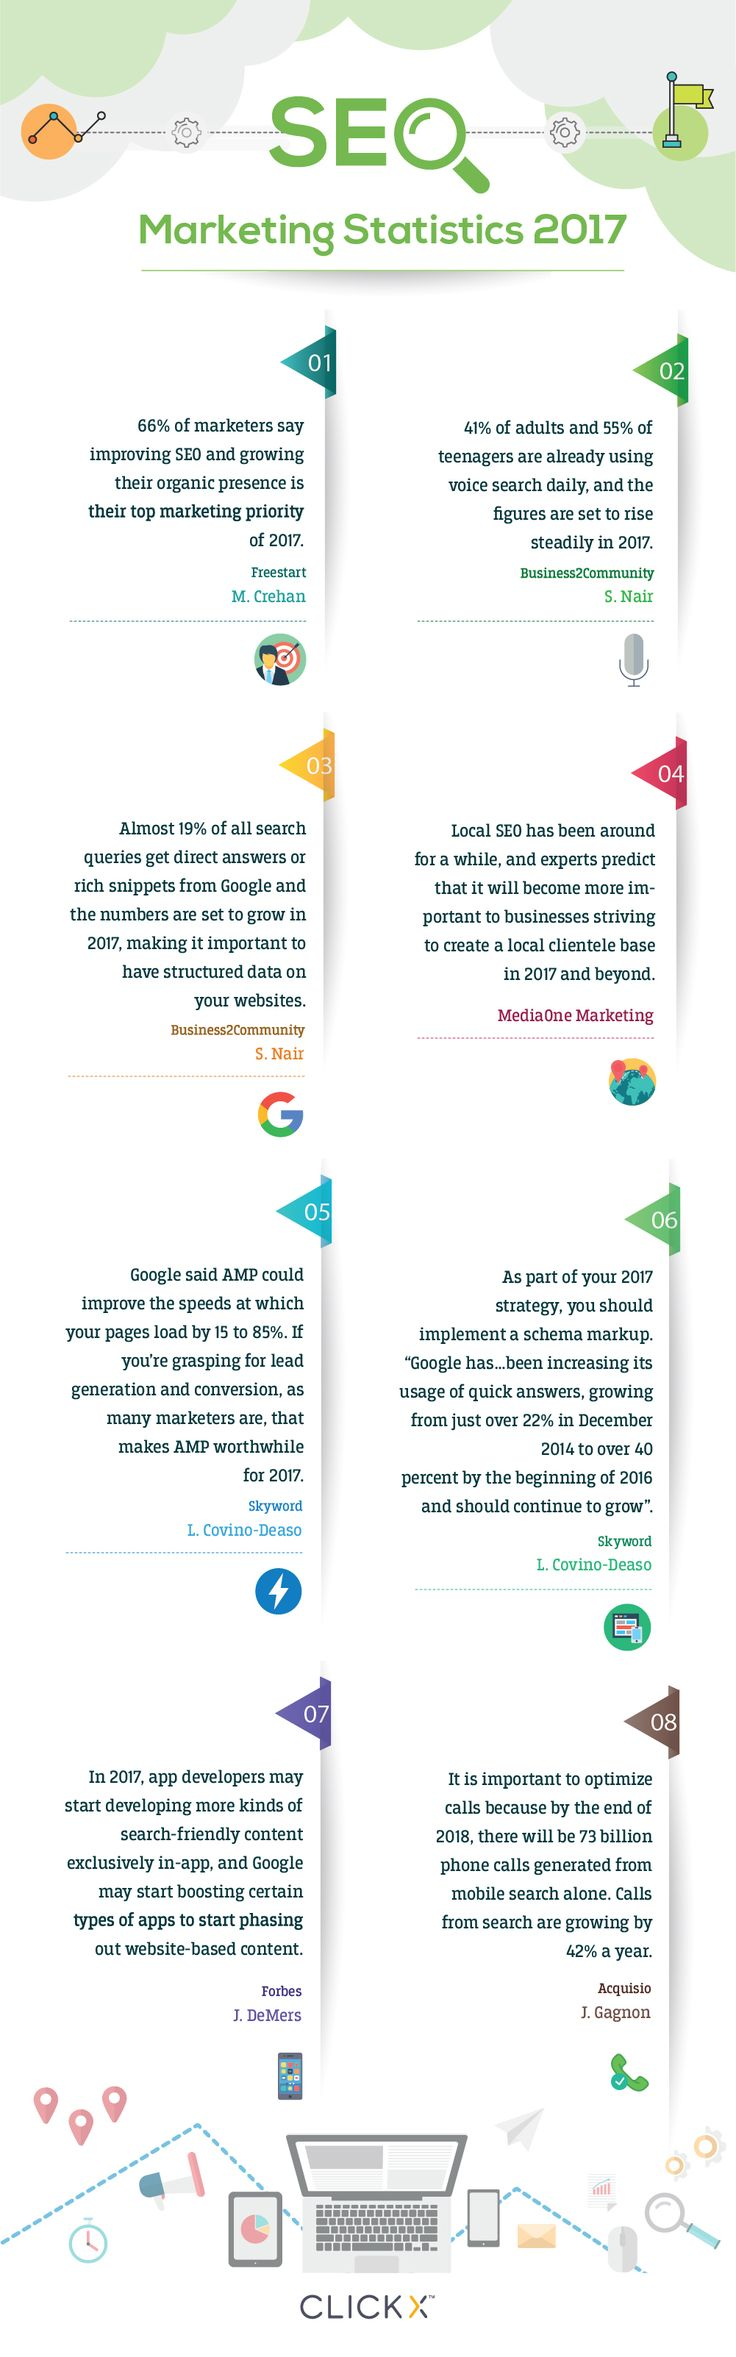 SEO Marketing Statistics for 2017 | Clickx.io